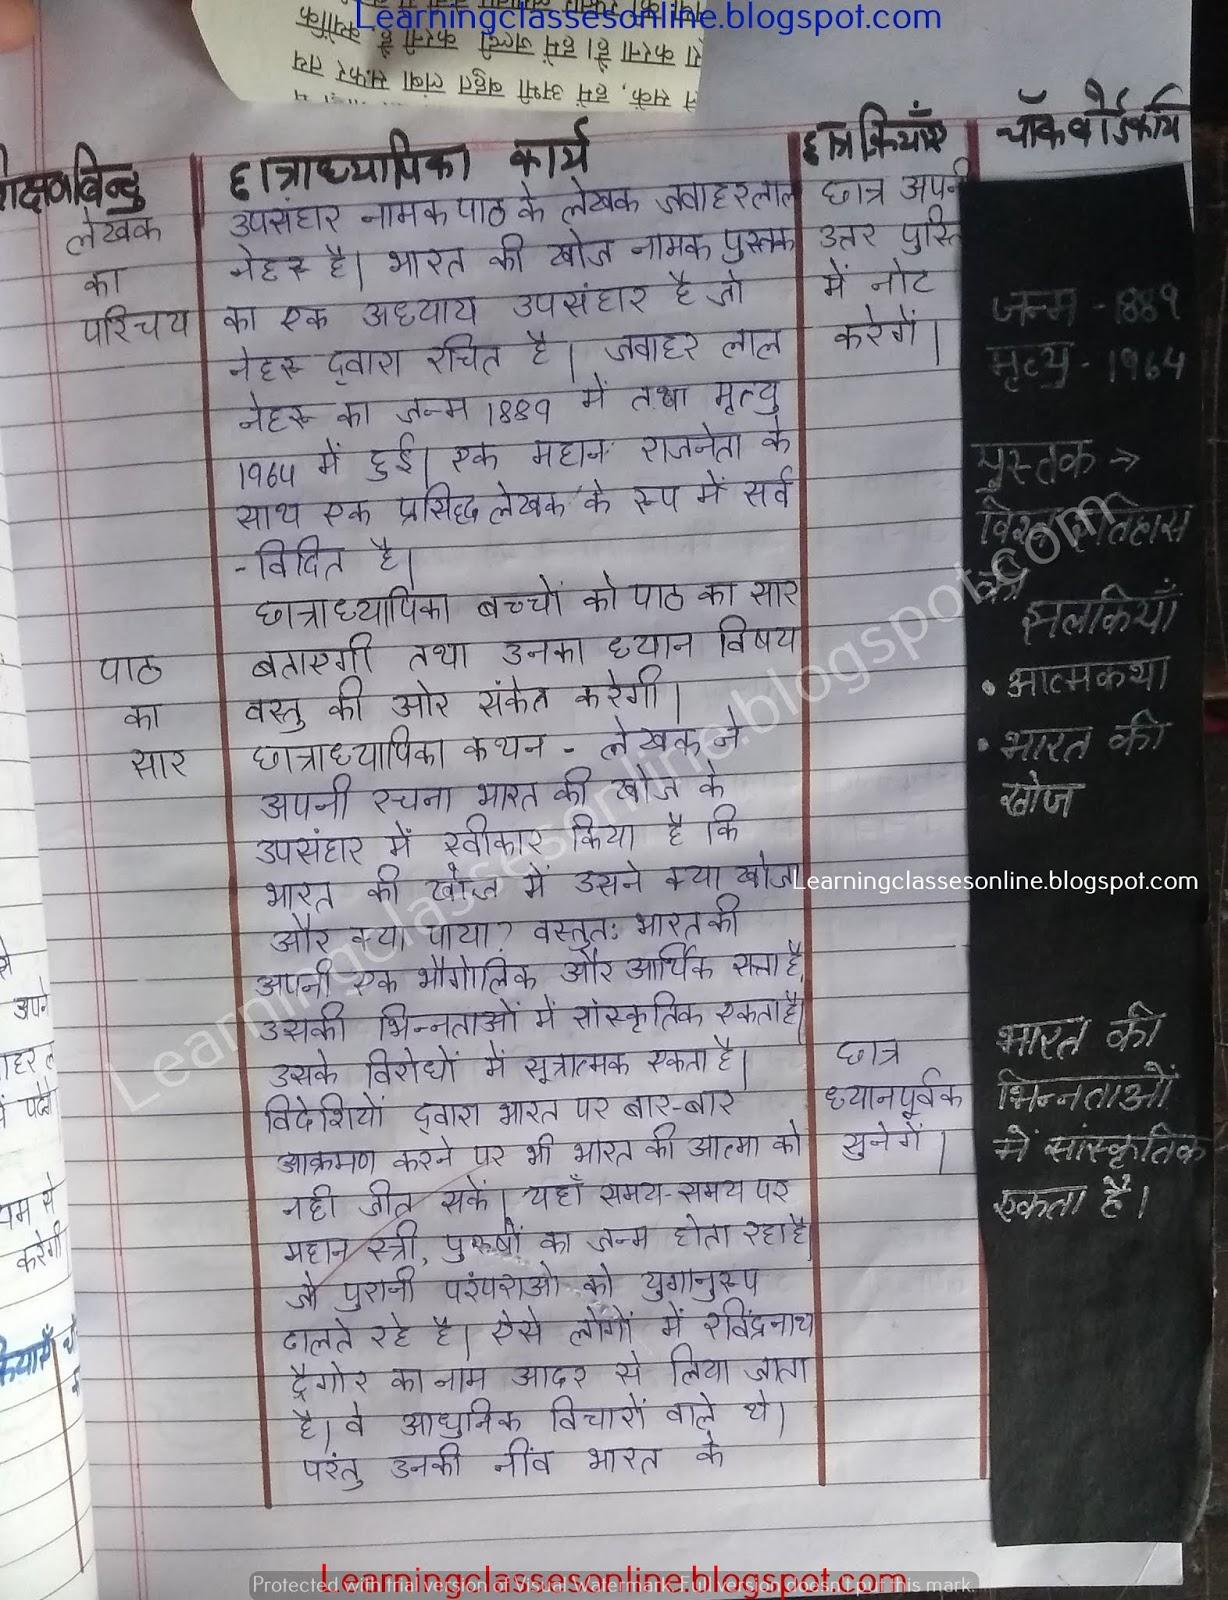 bed, ded, deled, btc lesson plan in hindi on jawaharlal nehru netaji